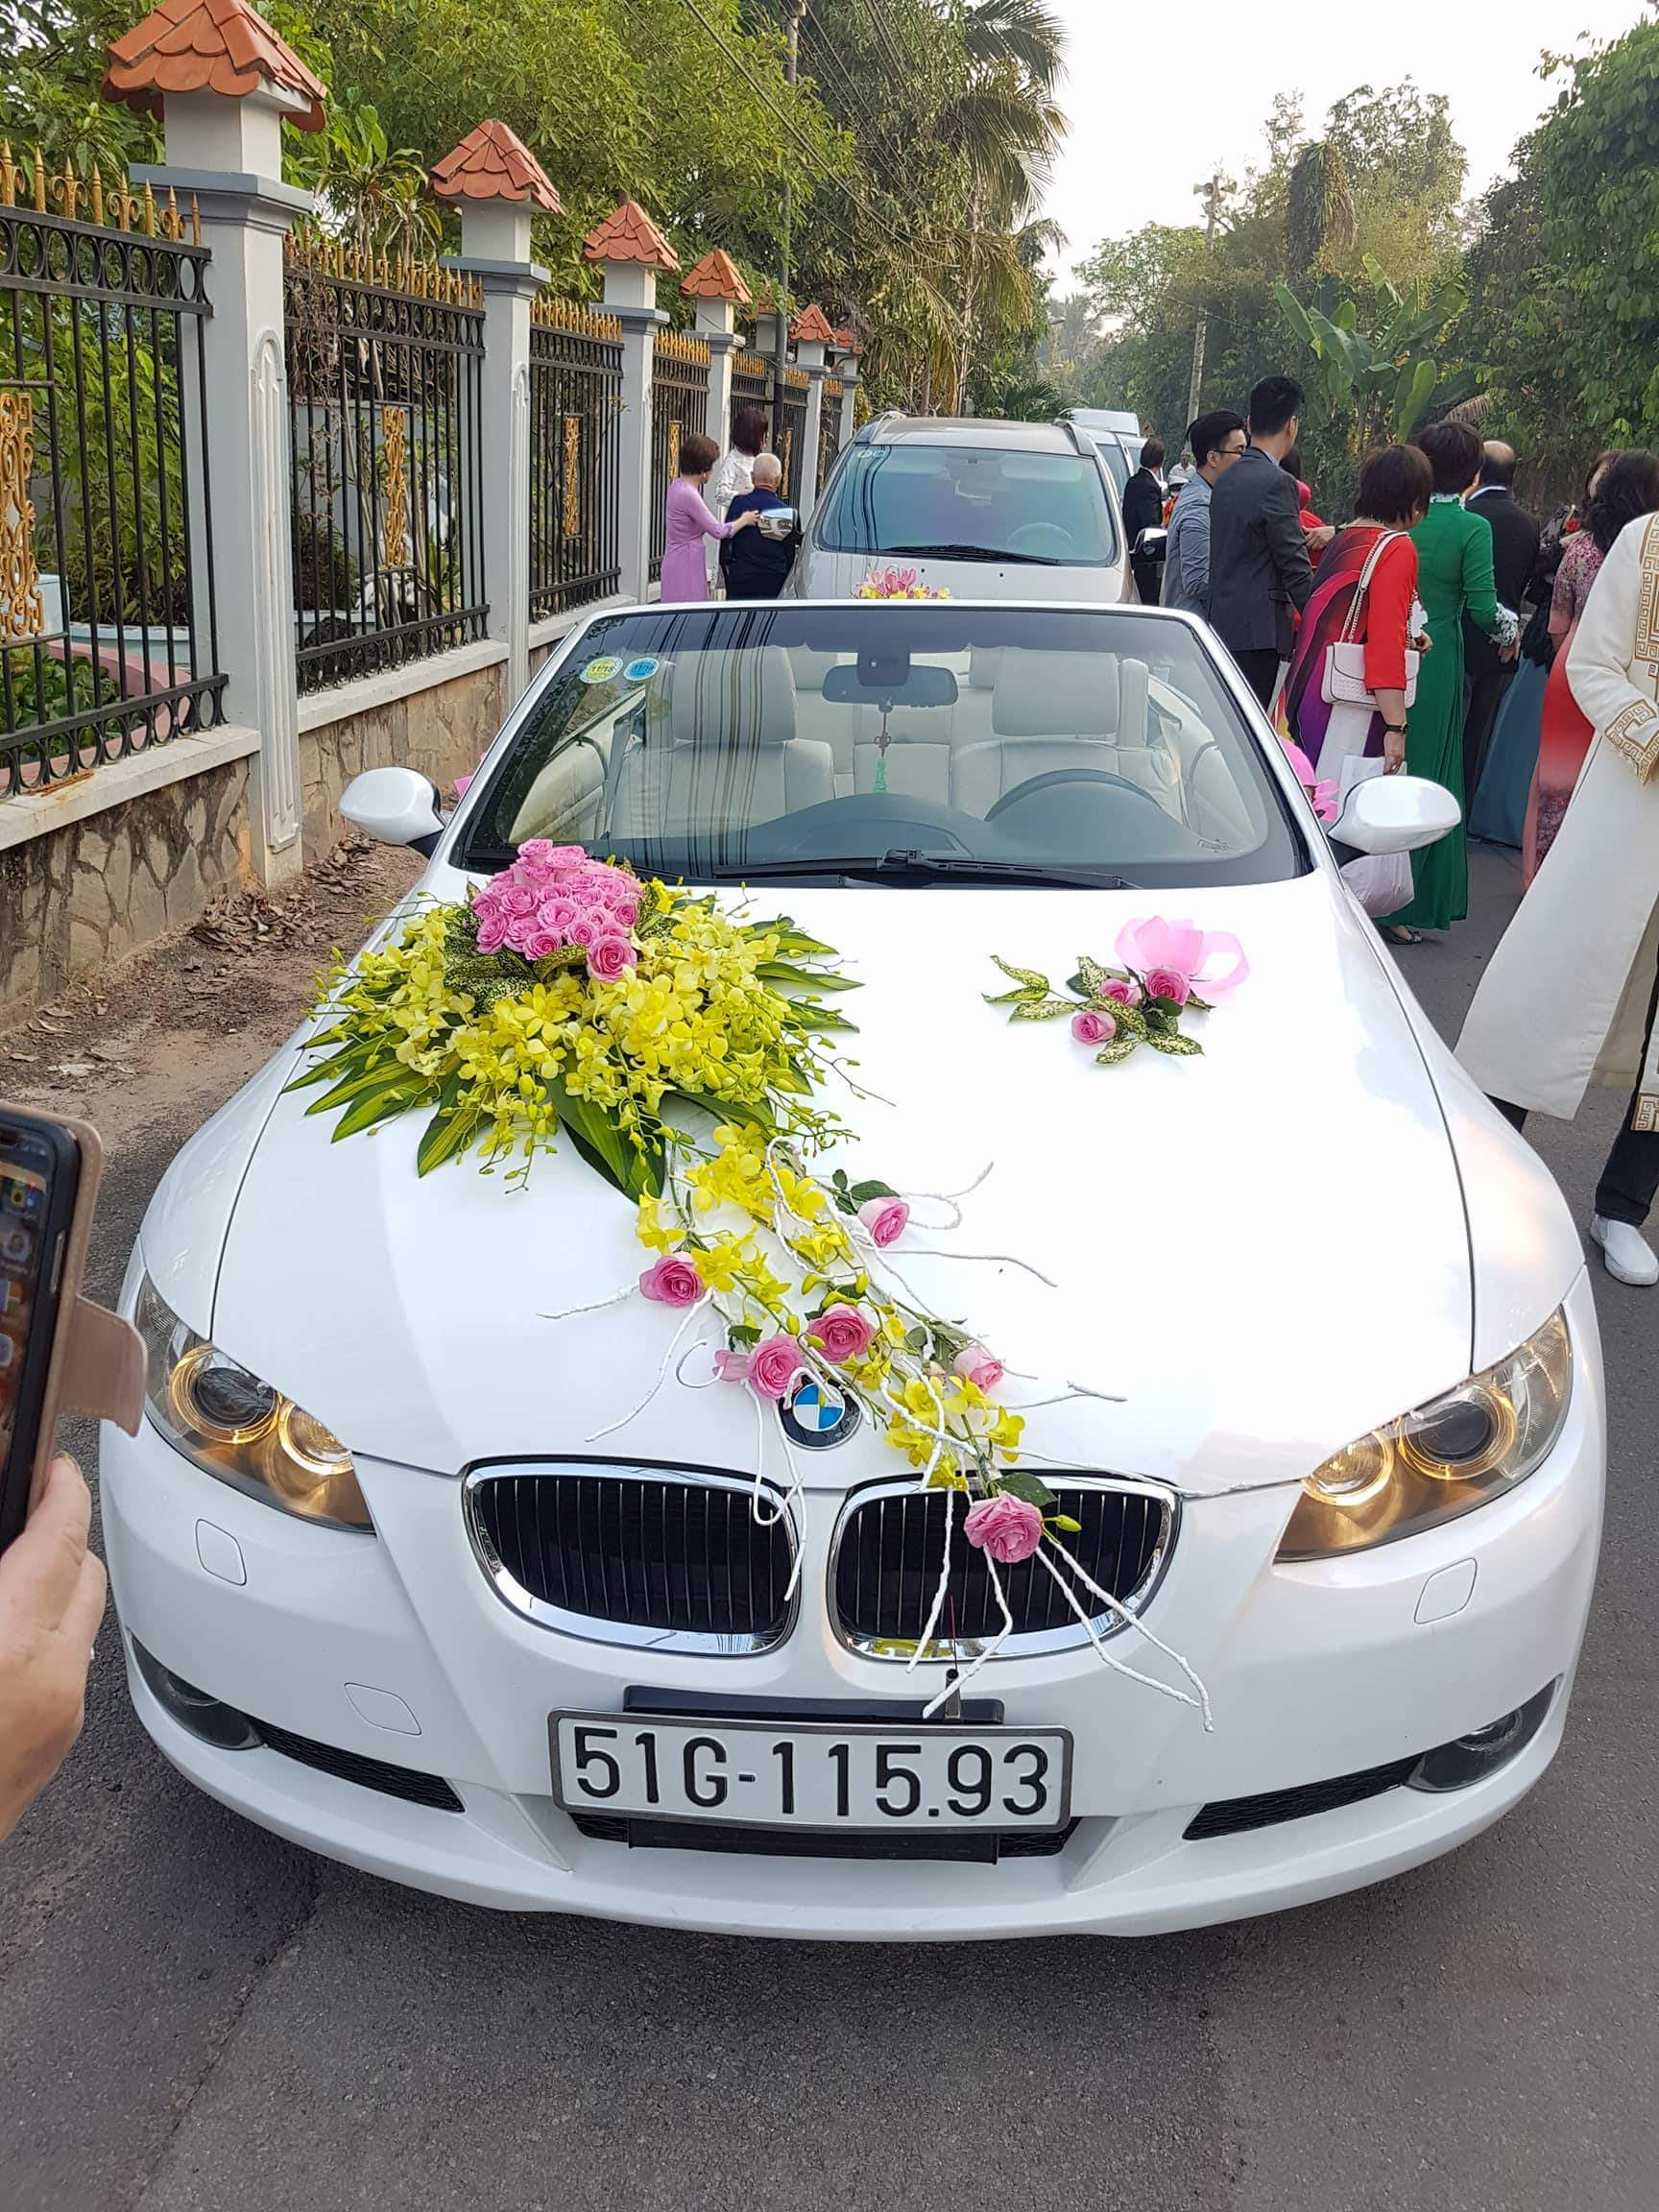 thuê xe hoa BMW mui trần